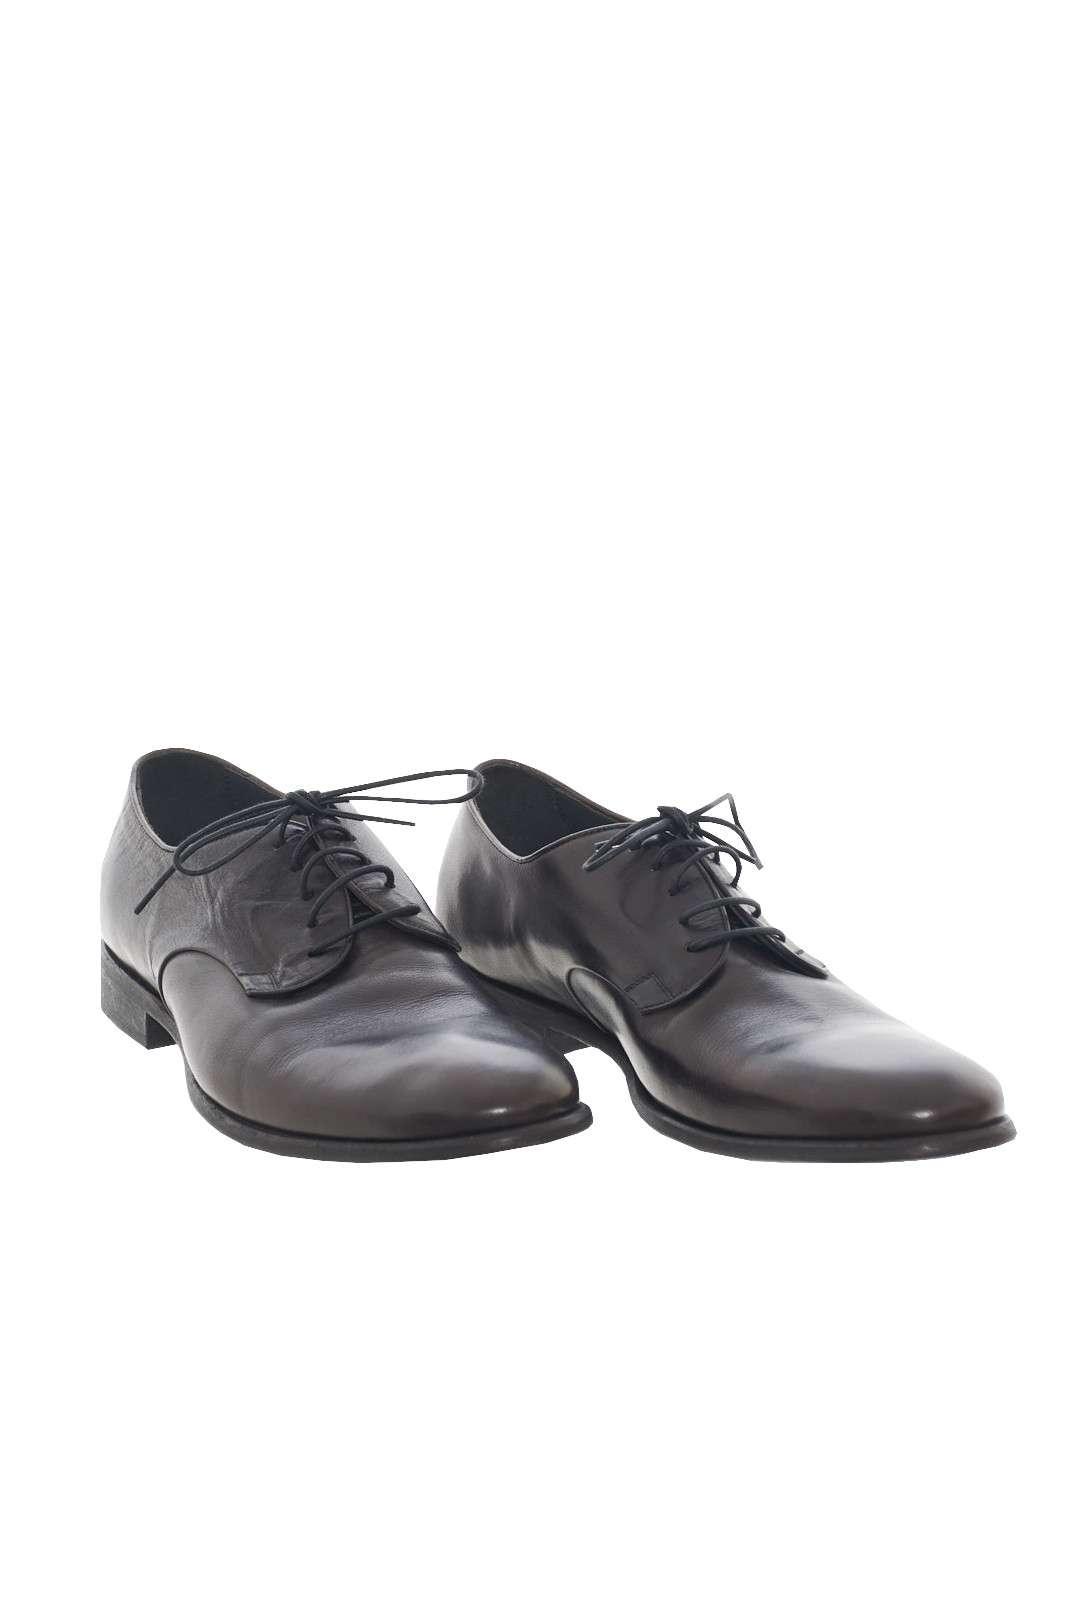 https://www.parmax.com/media/catalog/product/a/i/AI-outlet_parmax-scarpe-uomo-Pantanetti-1142-D.jpg